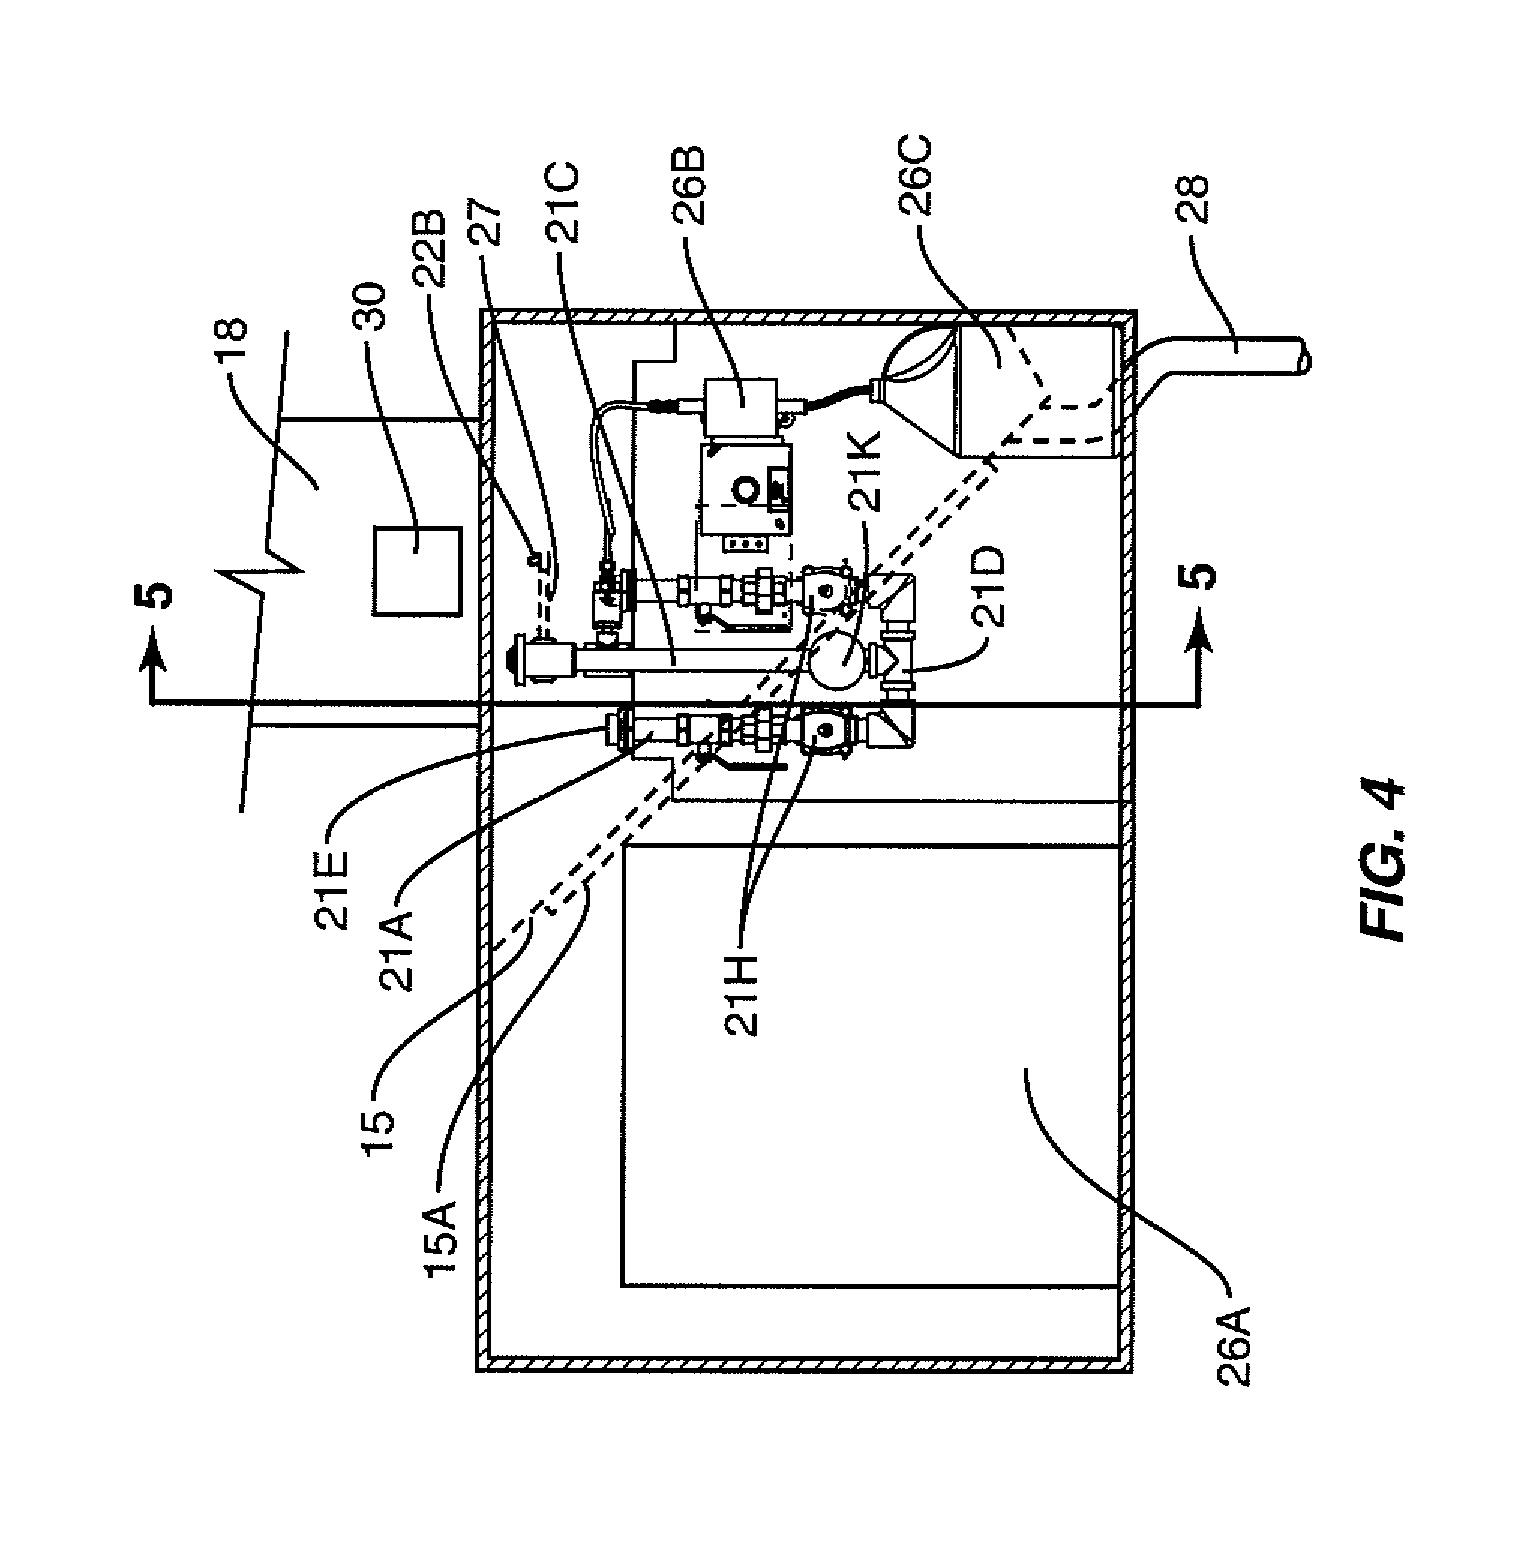 Alpine Ive W530abt Wiring Diagram